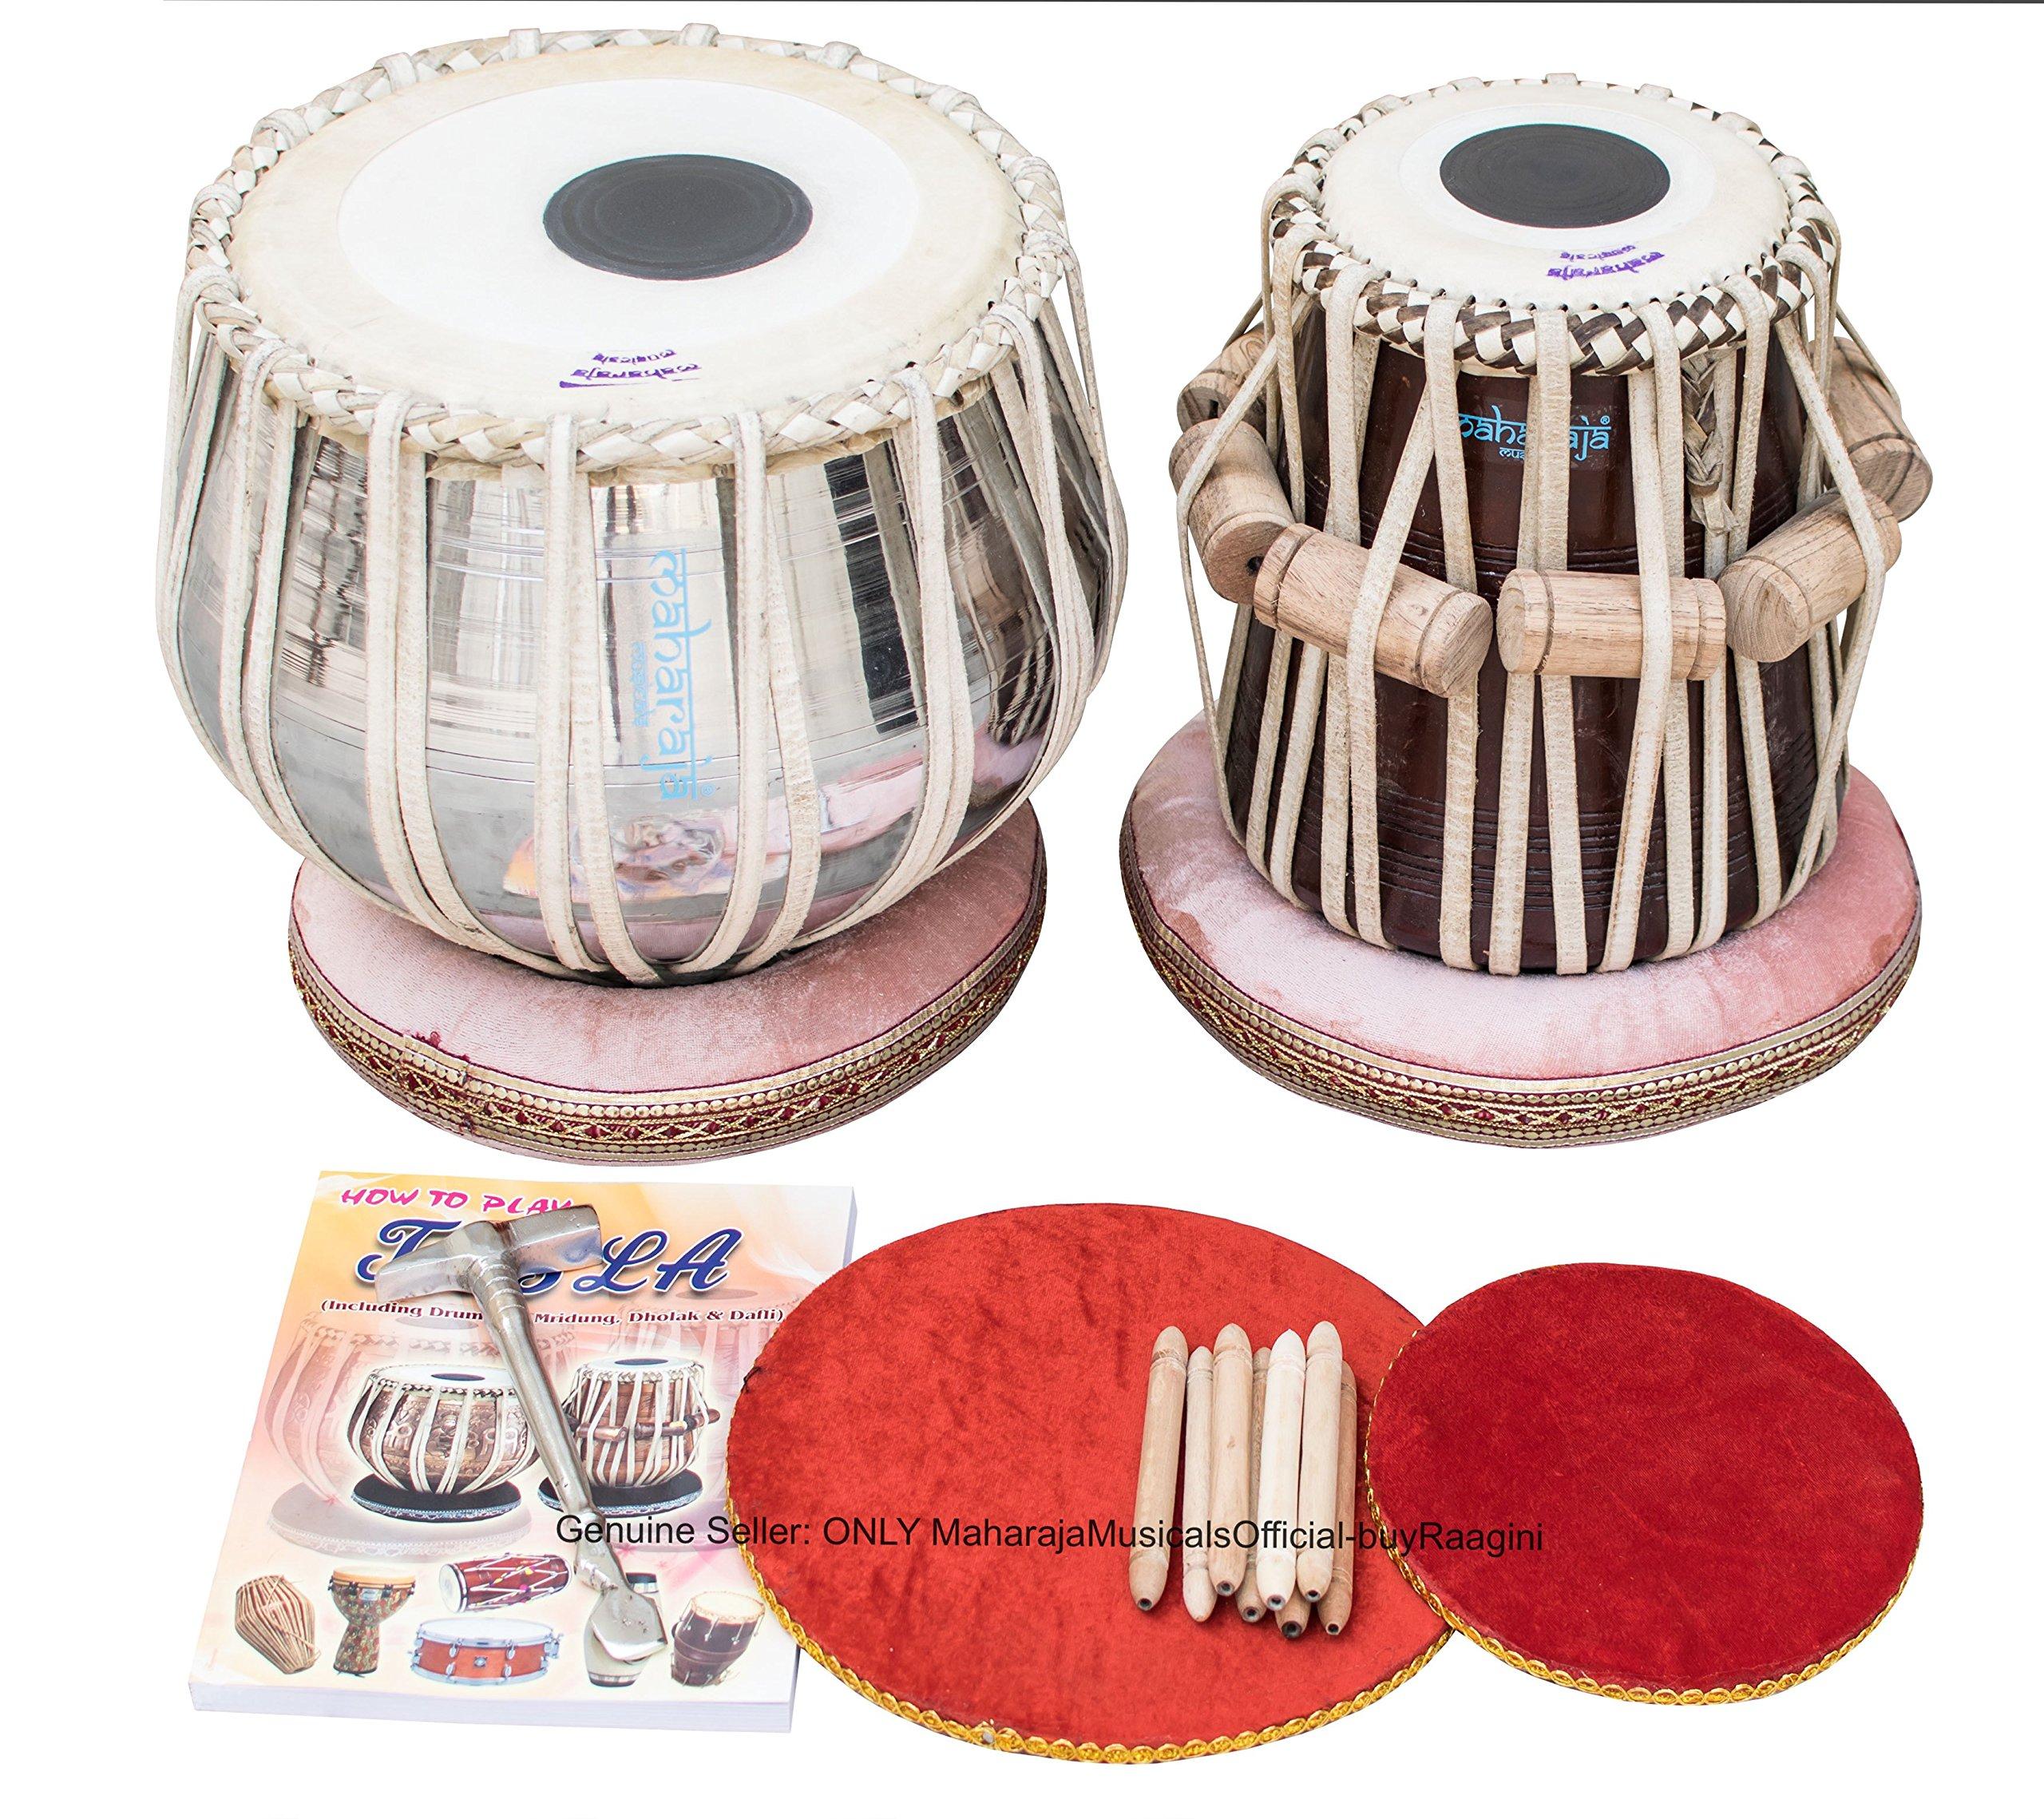 Maharaja Musicals Tabla Set, Classic Brass Tabla Drums, Brass Bayan 3 Kg, Sheesham Tabla Dayan, Nylon Bag, Book, Hammer, Cushions, Cover (PDI-CG)